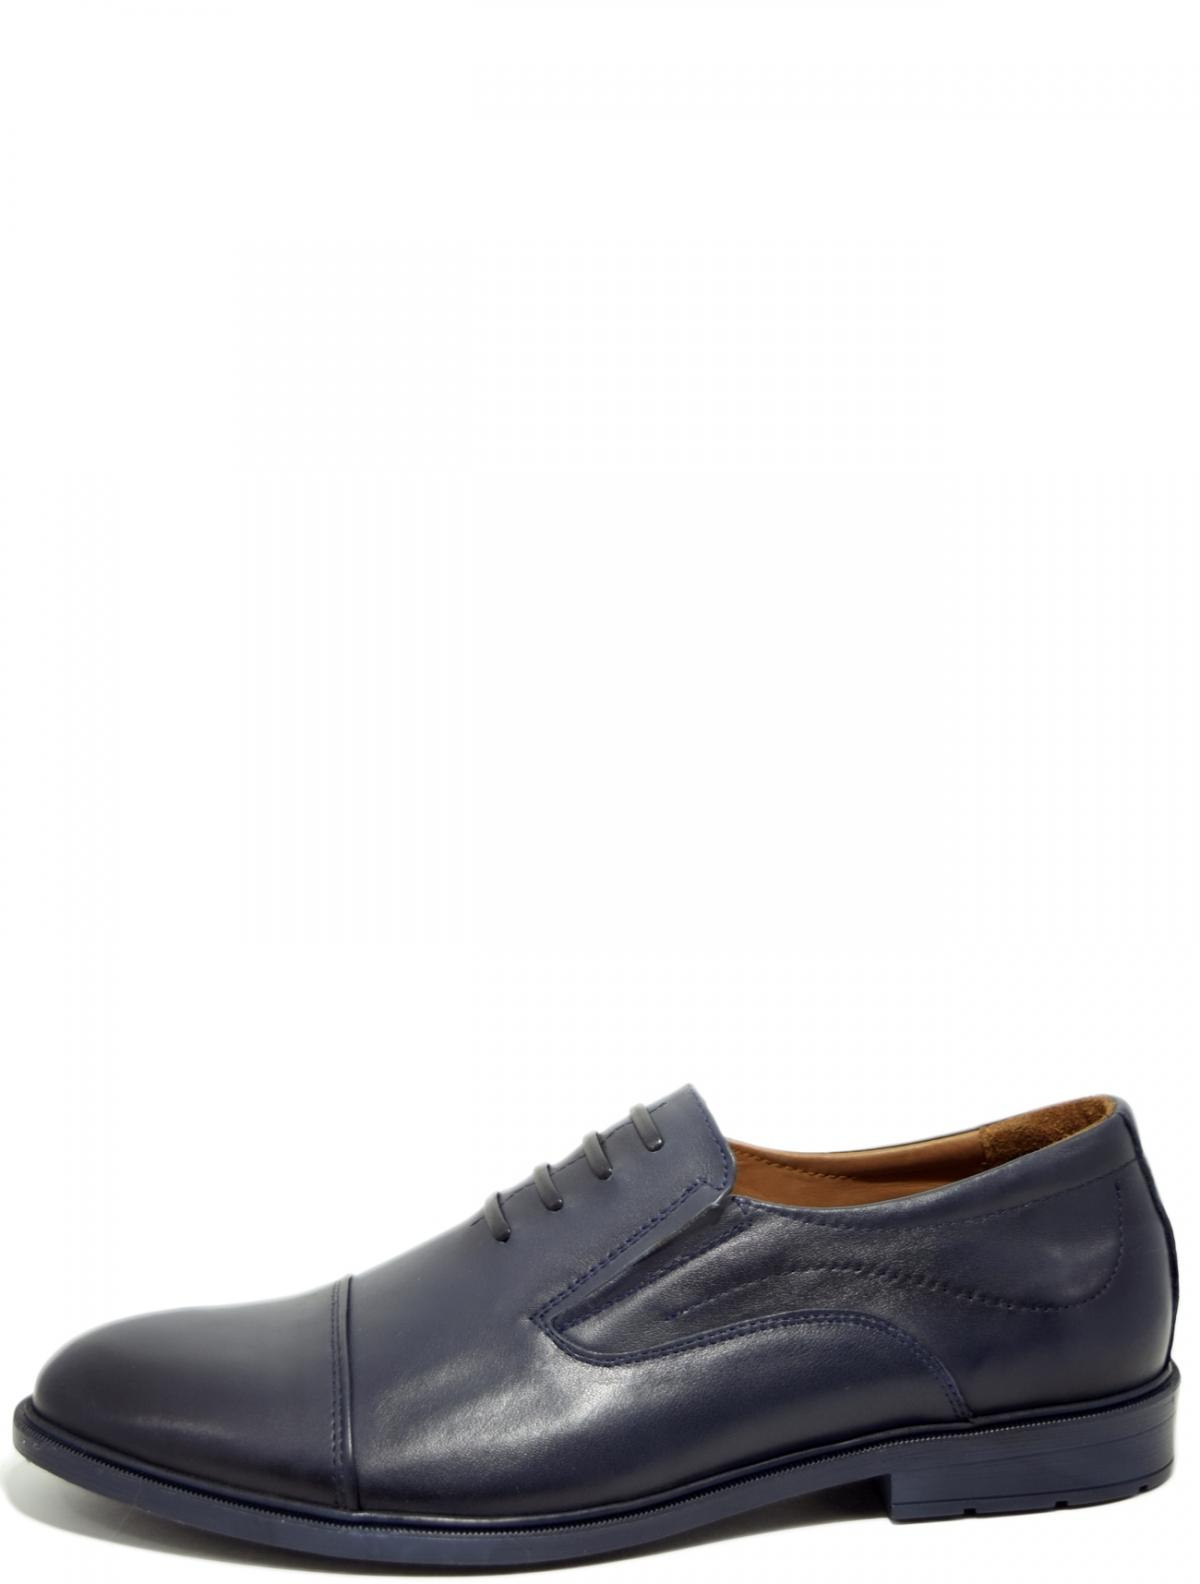 Bossner 5-365-201-1 мужские туфли